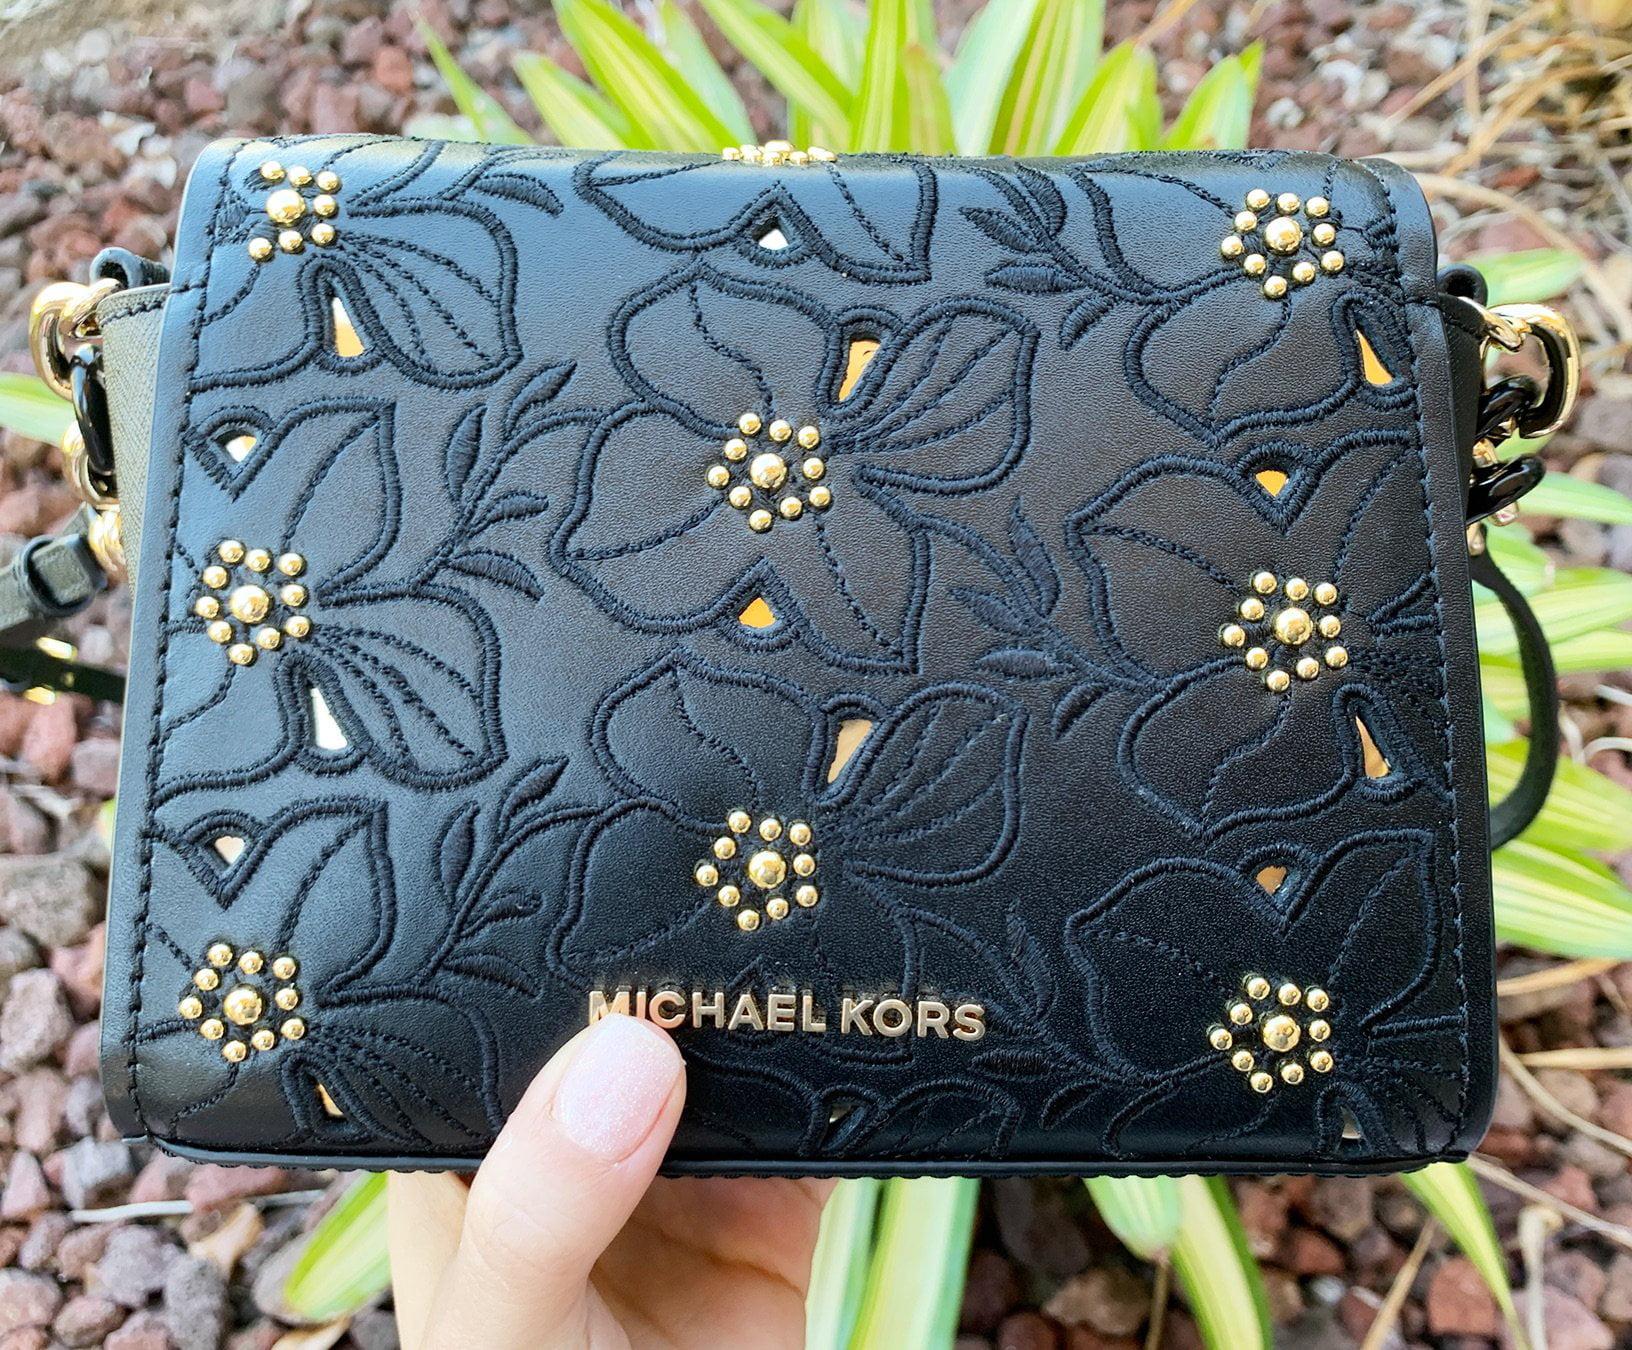 a522a24fb594ef Michael Kors Sofia Small Crossbody Black Pale Gold Perforated Floral  Studded - Walmart.com